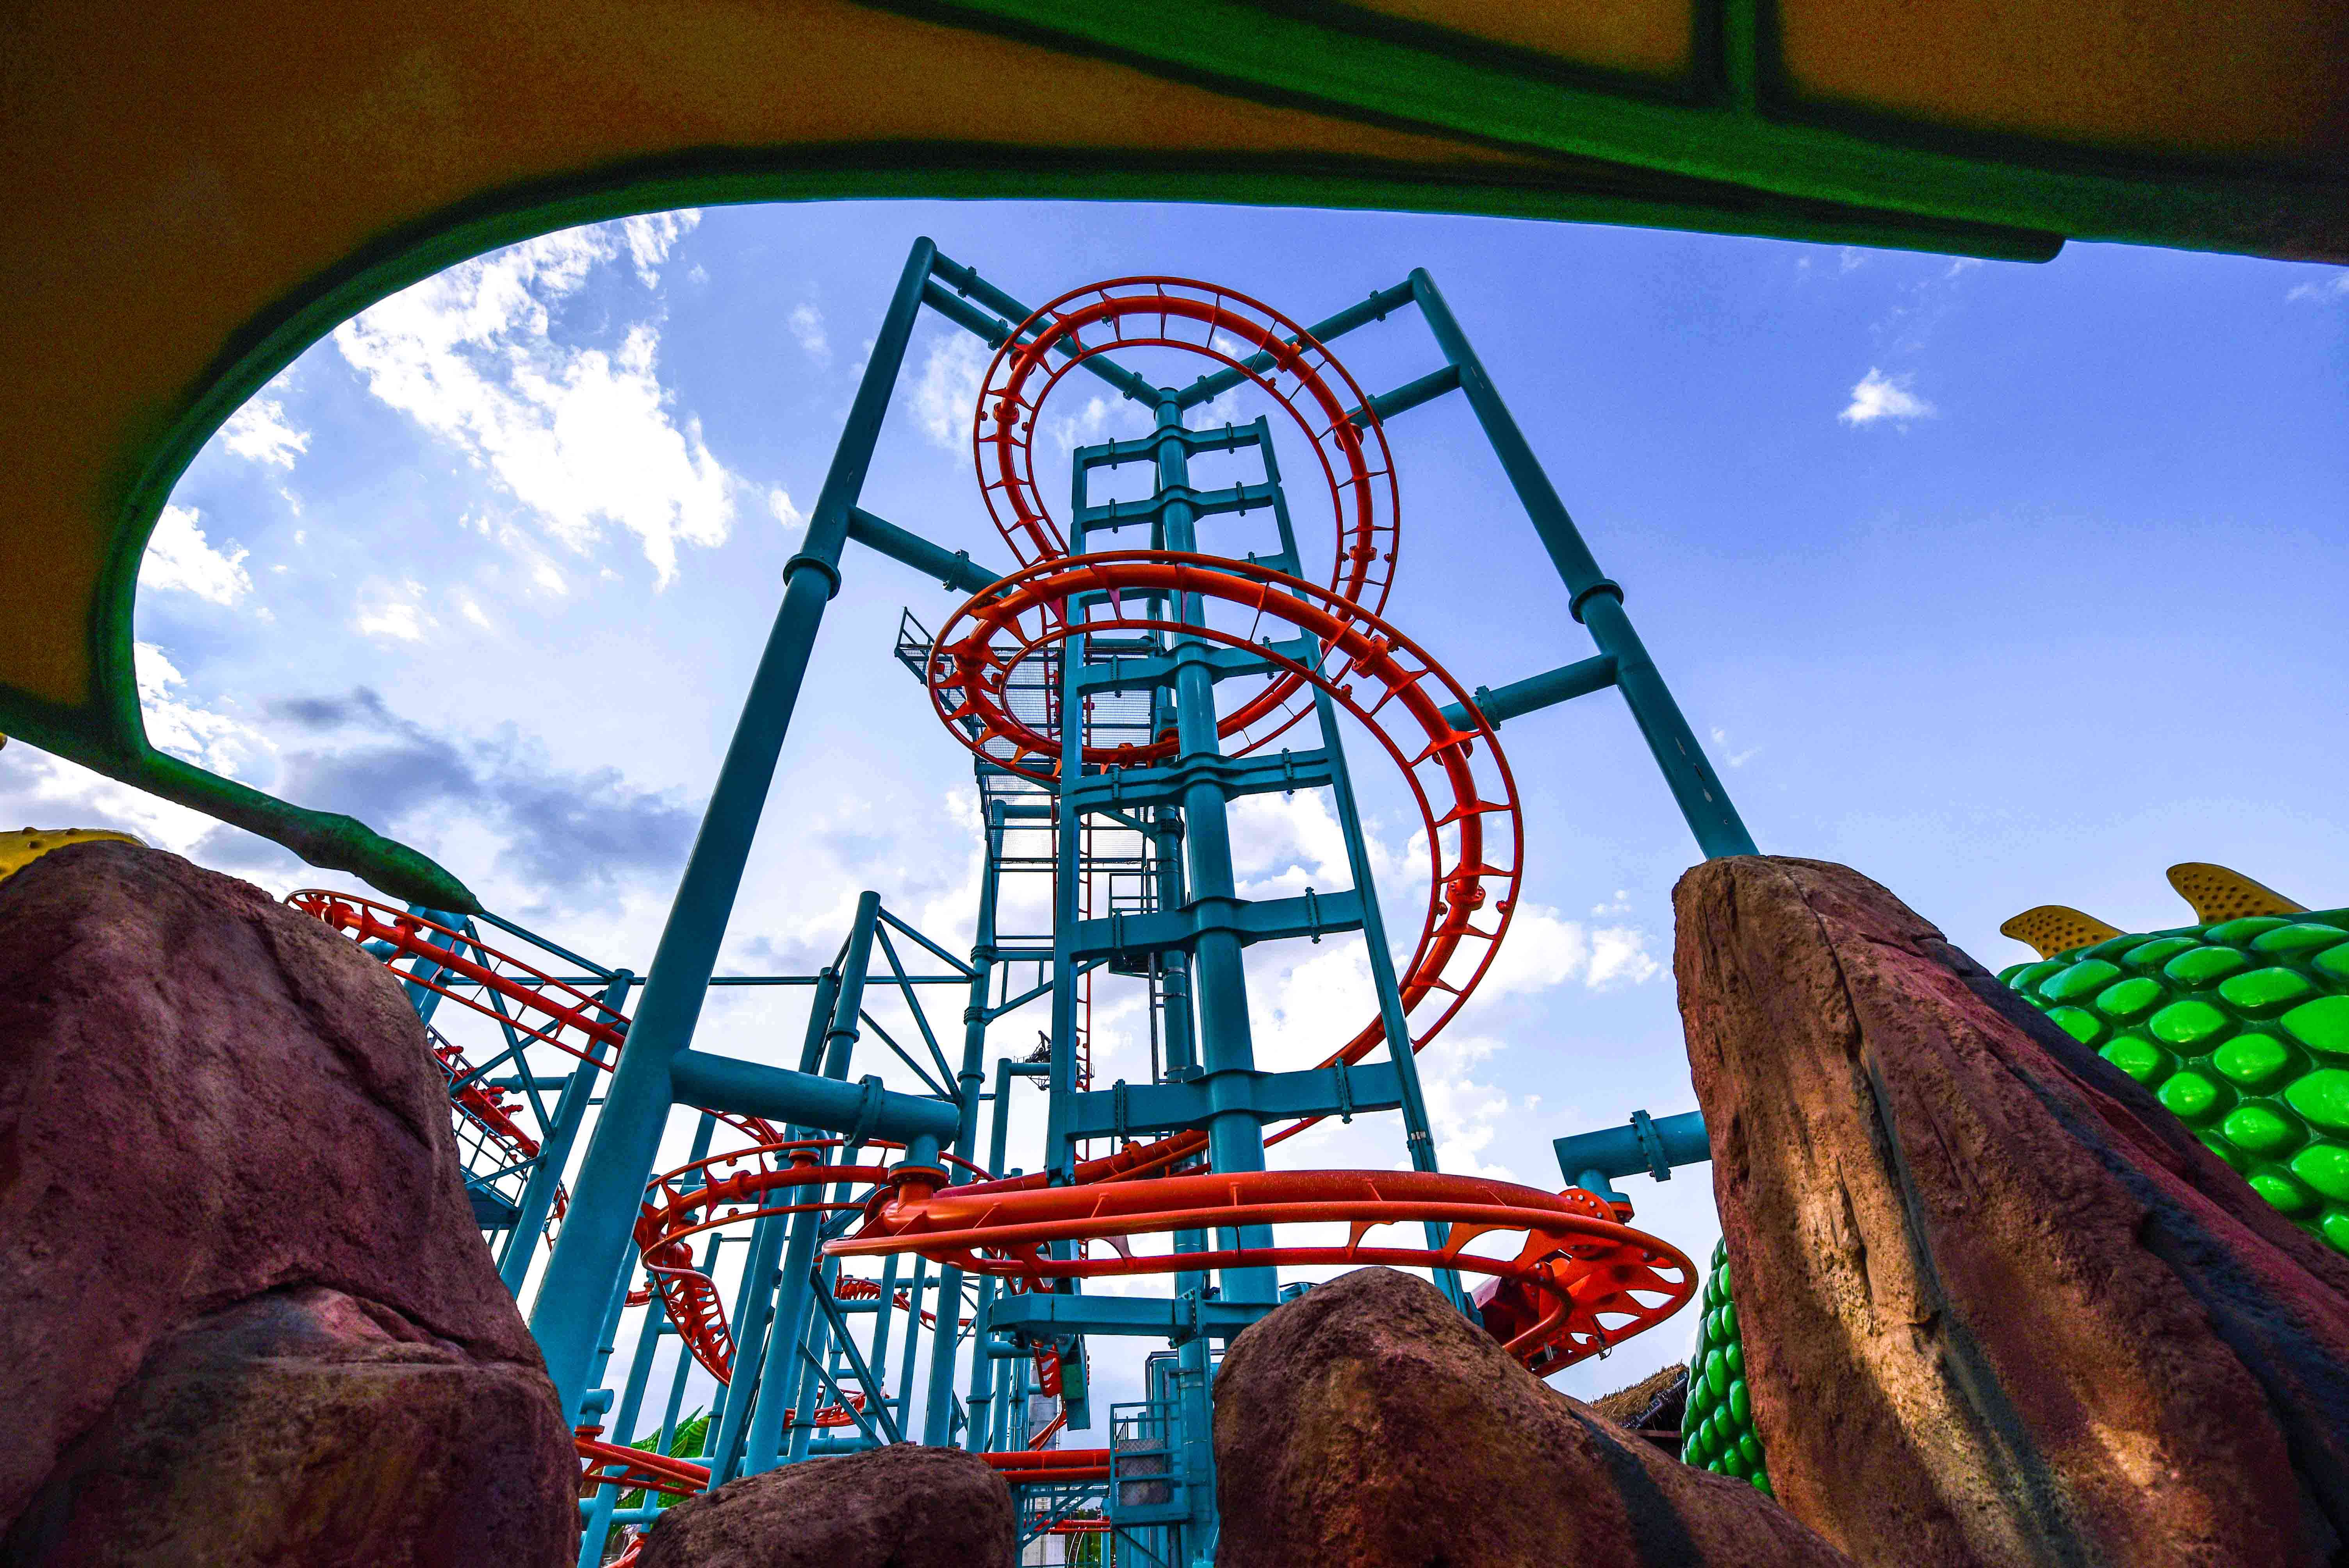 Wonderland Eurasia theme park